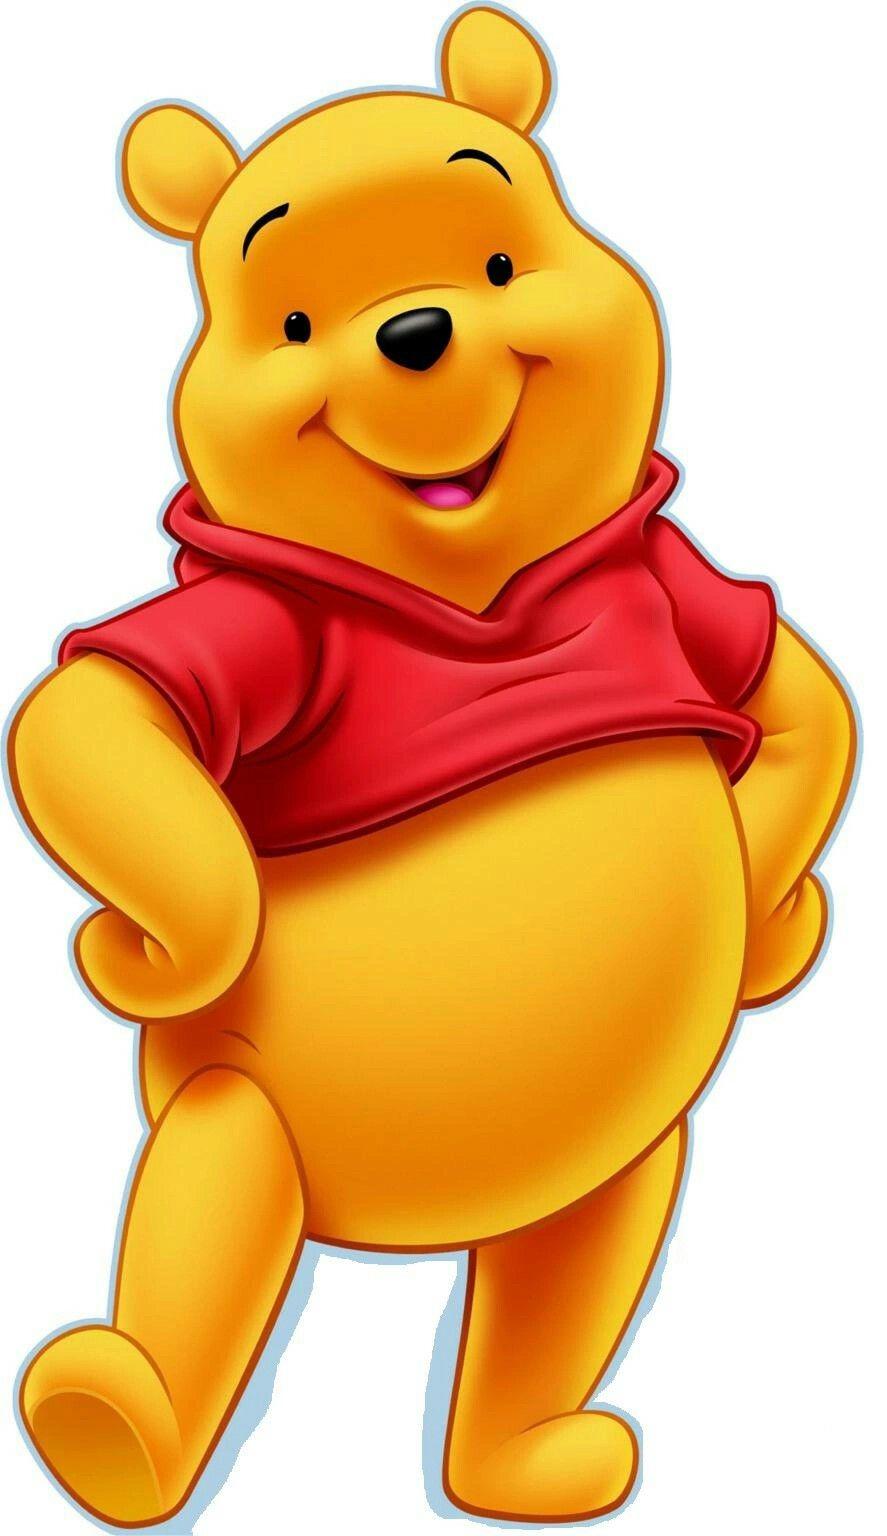 Pin de Linda Harcey en Winnie the Pooh | Pinterest